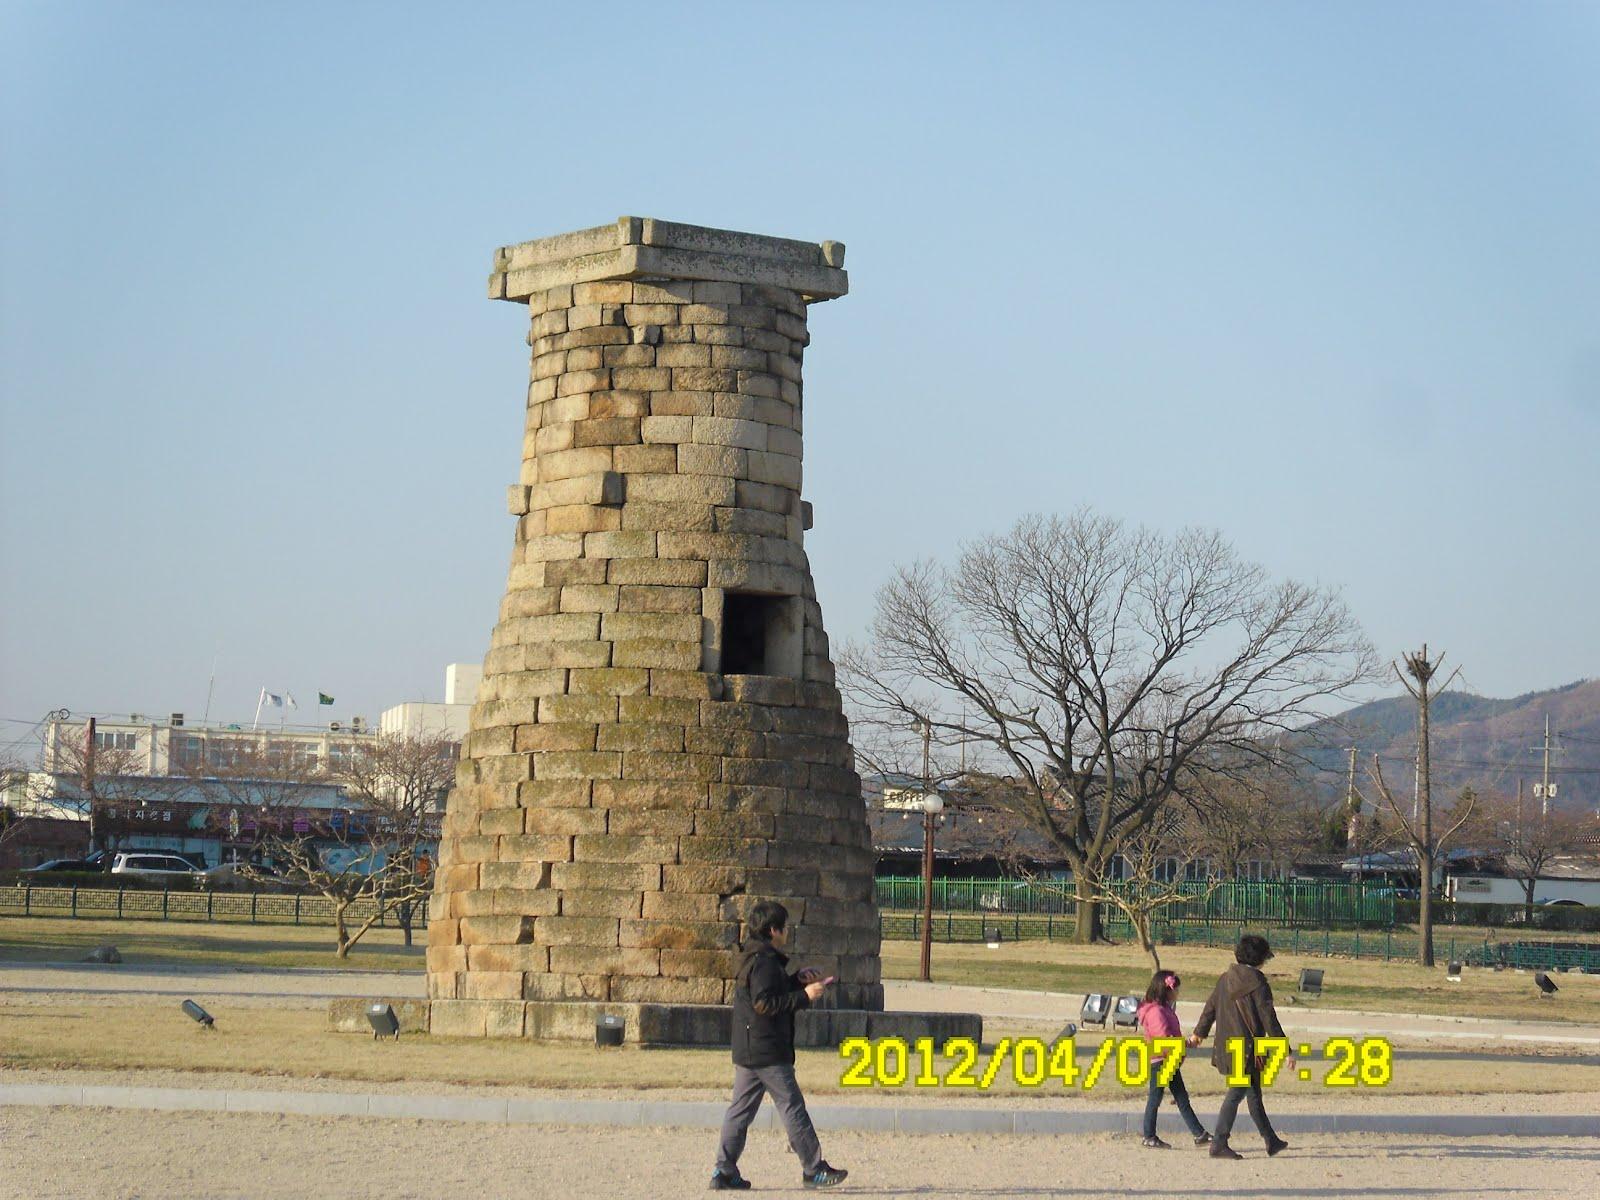 慶州瞻星台の画像 p1_11